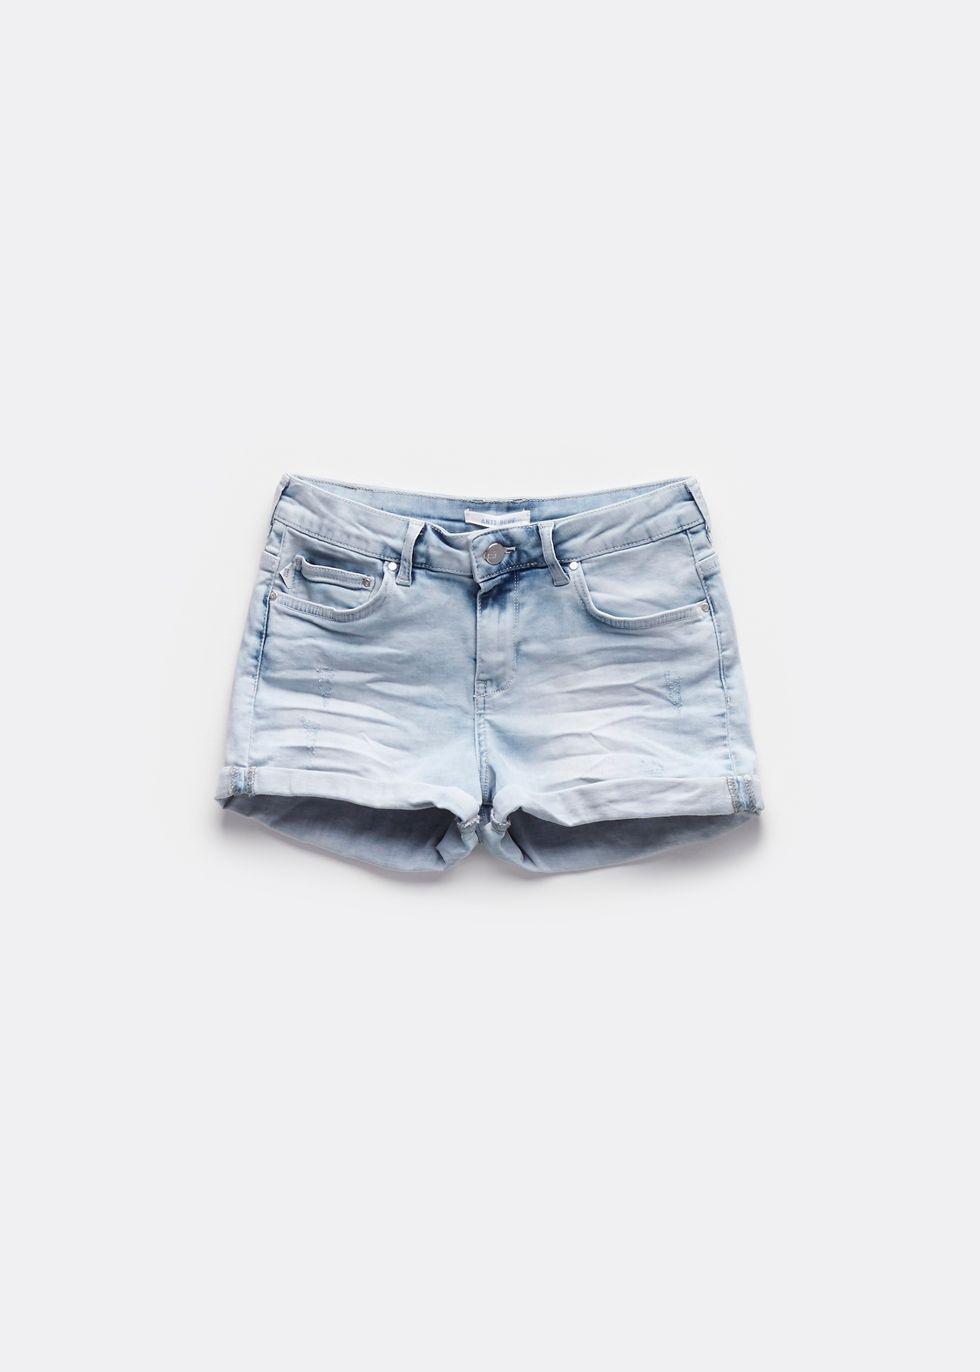 Denim shorts   The Sting